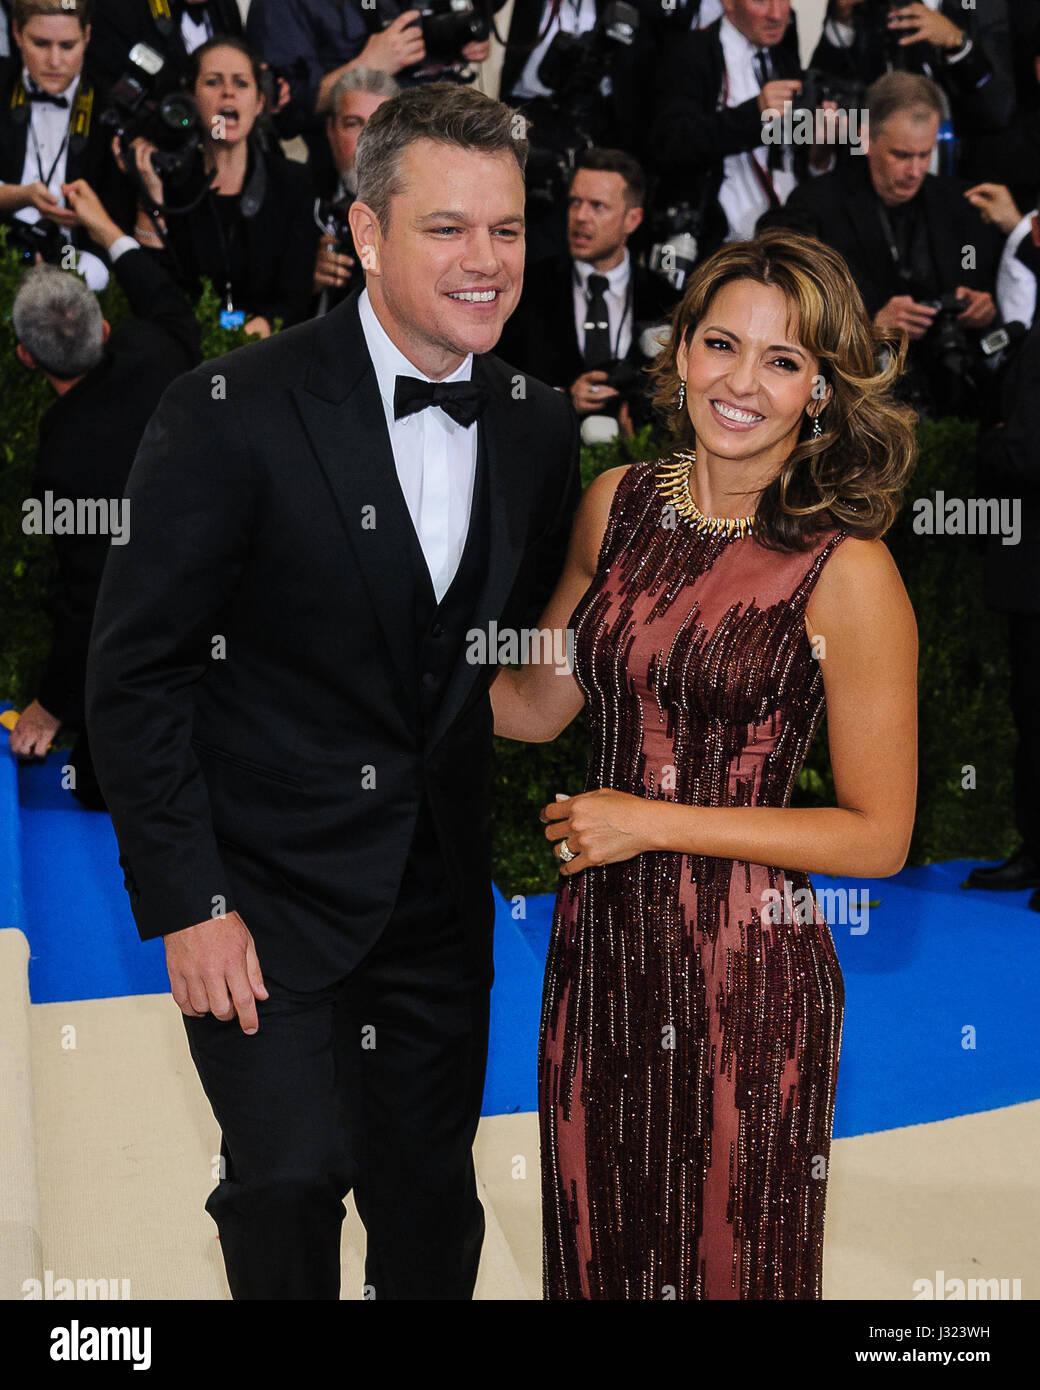 Nueva York, NY, EUA. El 1 de mayo de 2017. Matt Damon, Luciana Barroso. 2017 Metropolitan Museum of Art Costume Imagen De Stock